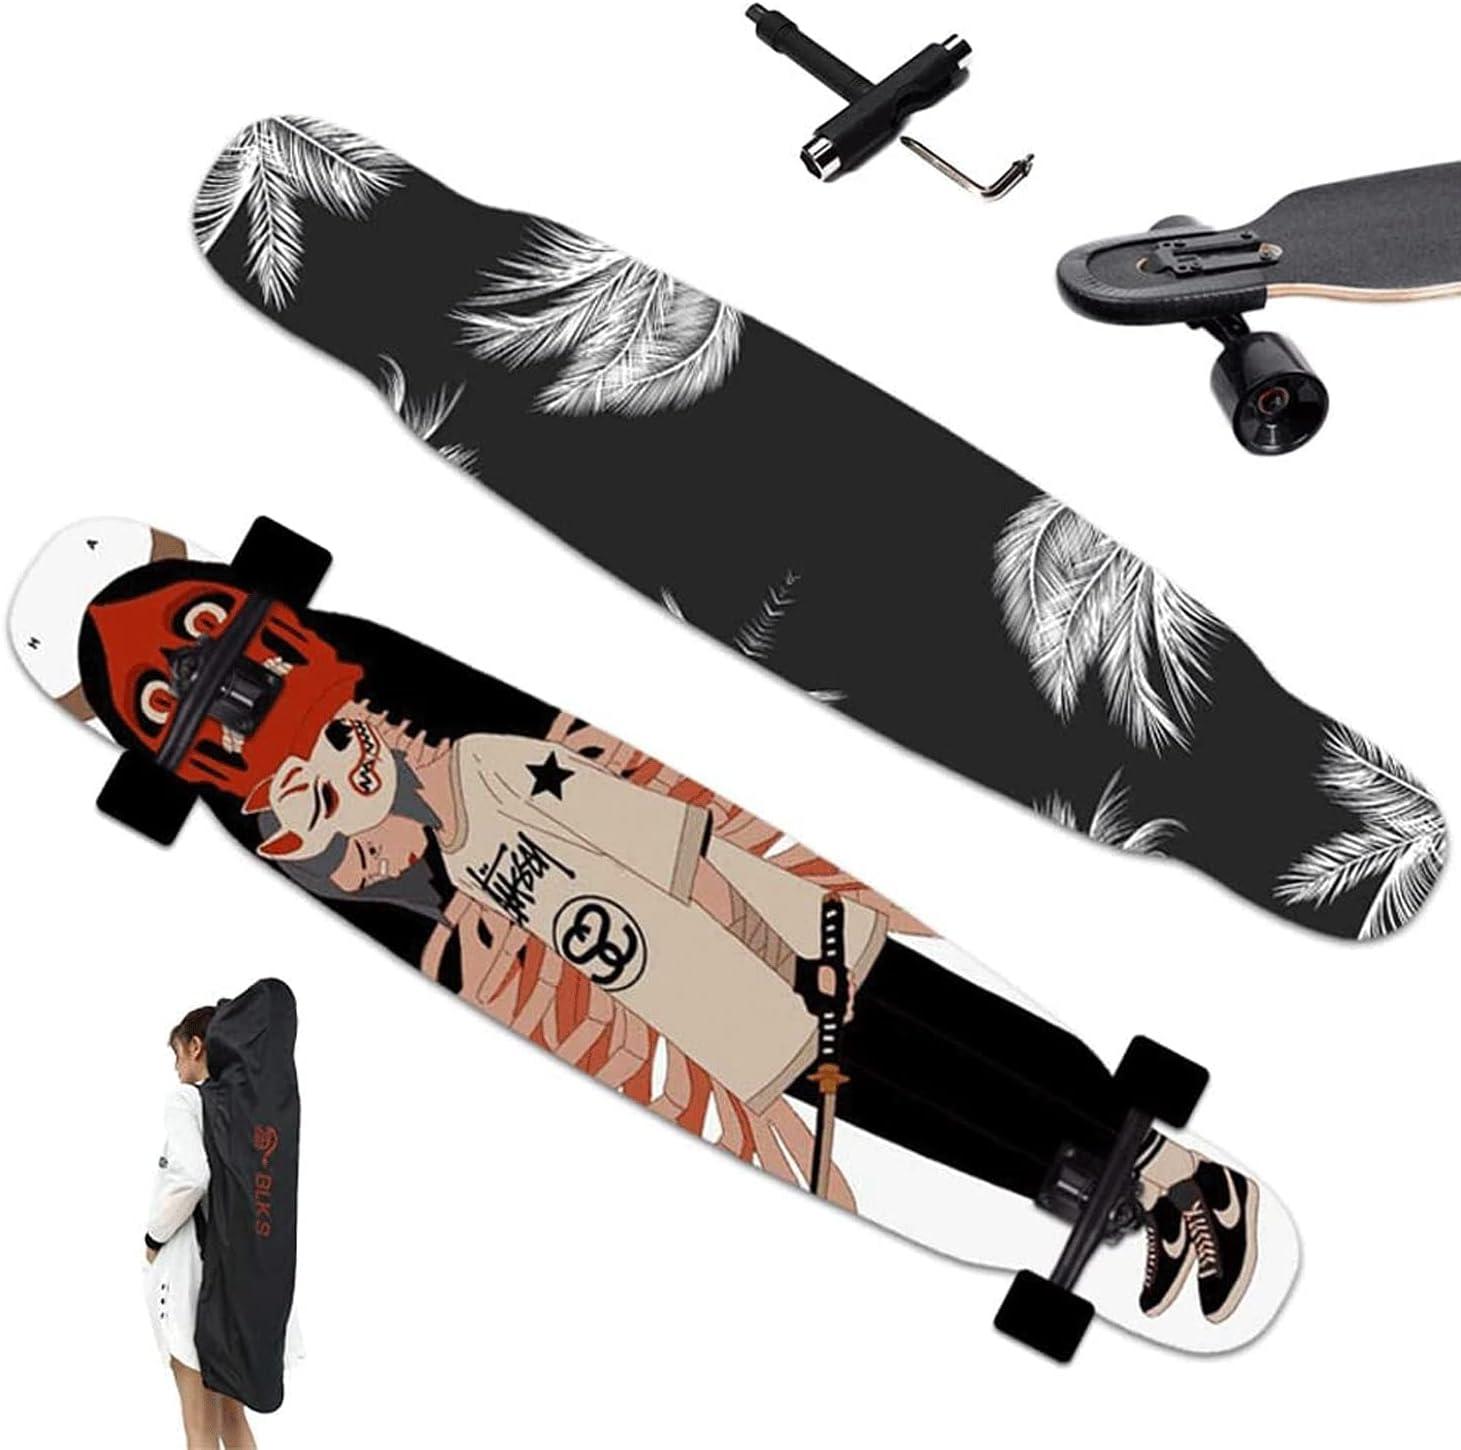 EEGUAI Skateboard Complete 7 Longboard Crui Layer Maple Max 62% Ranking TOP7 OFF